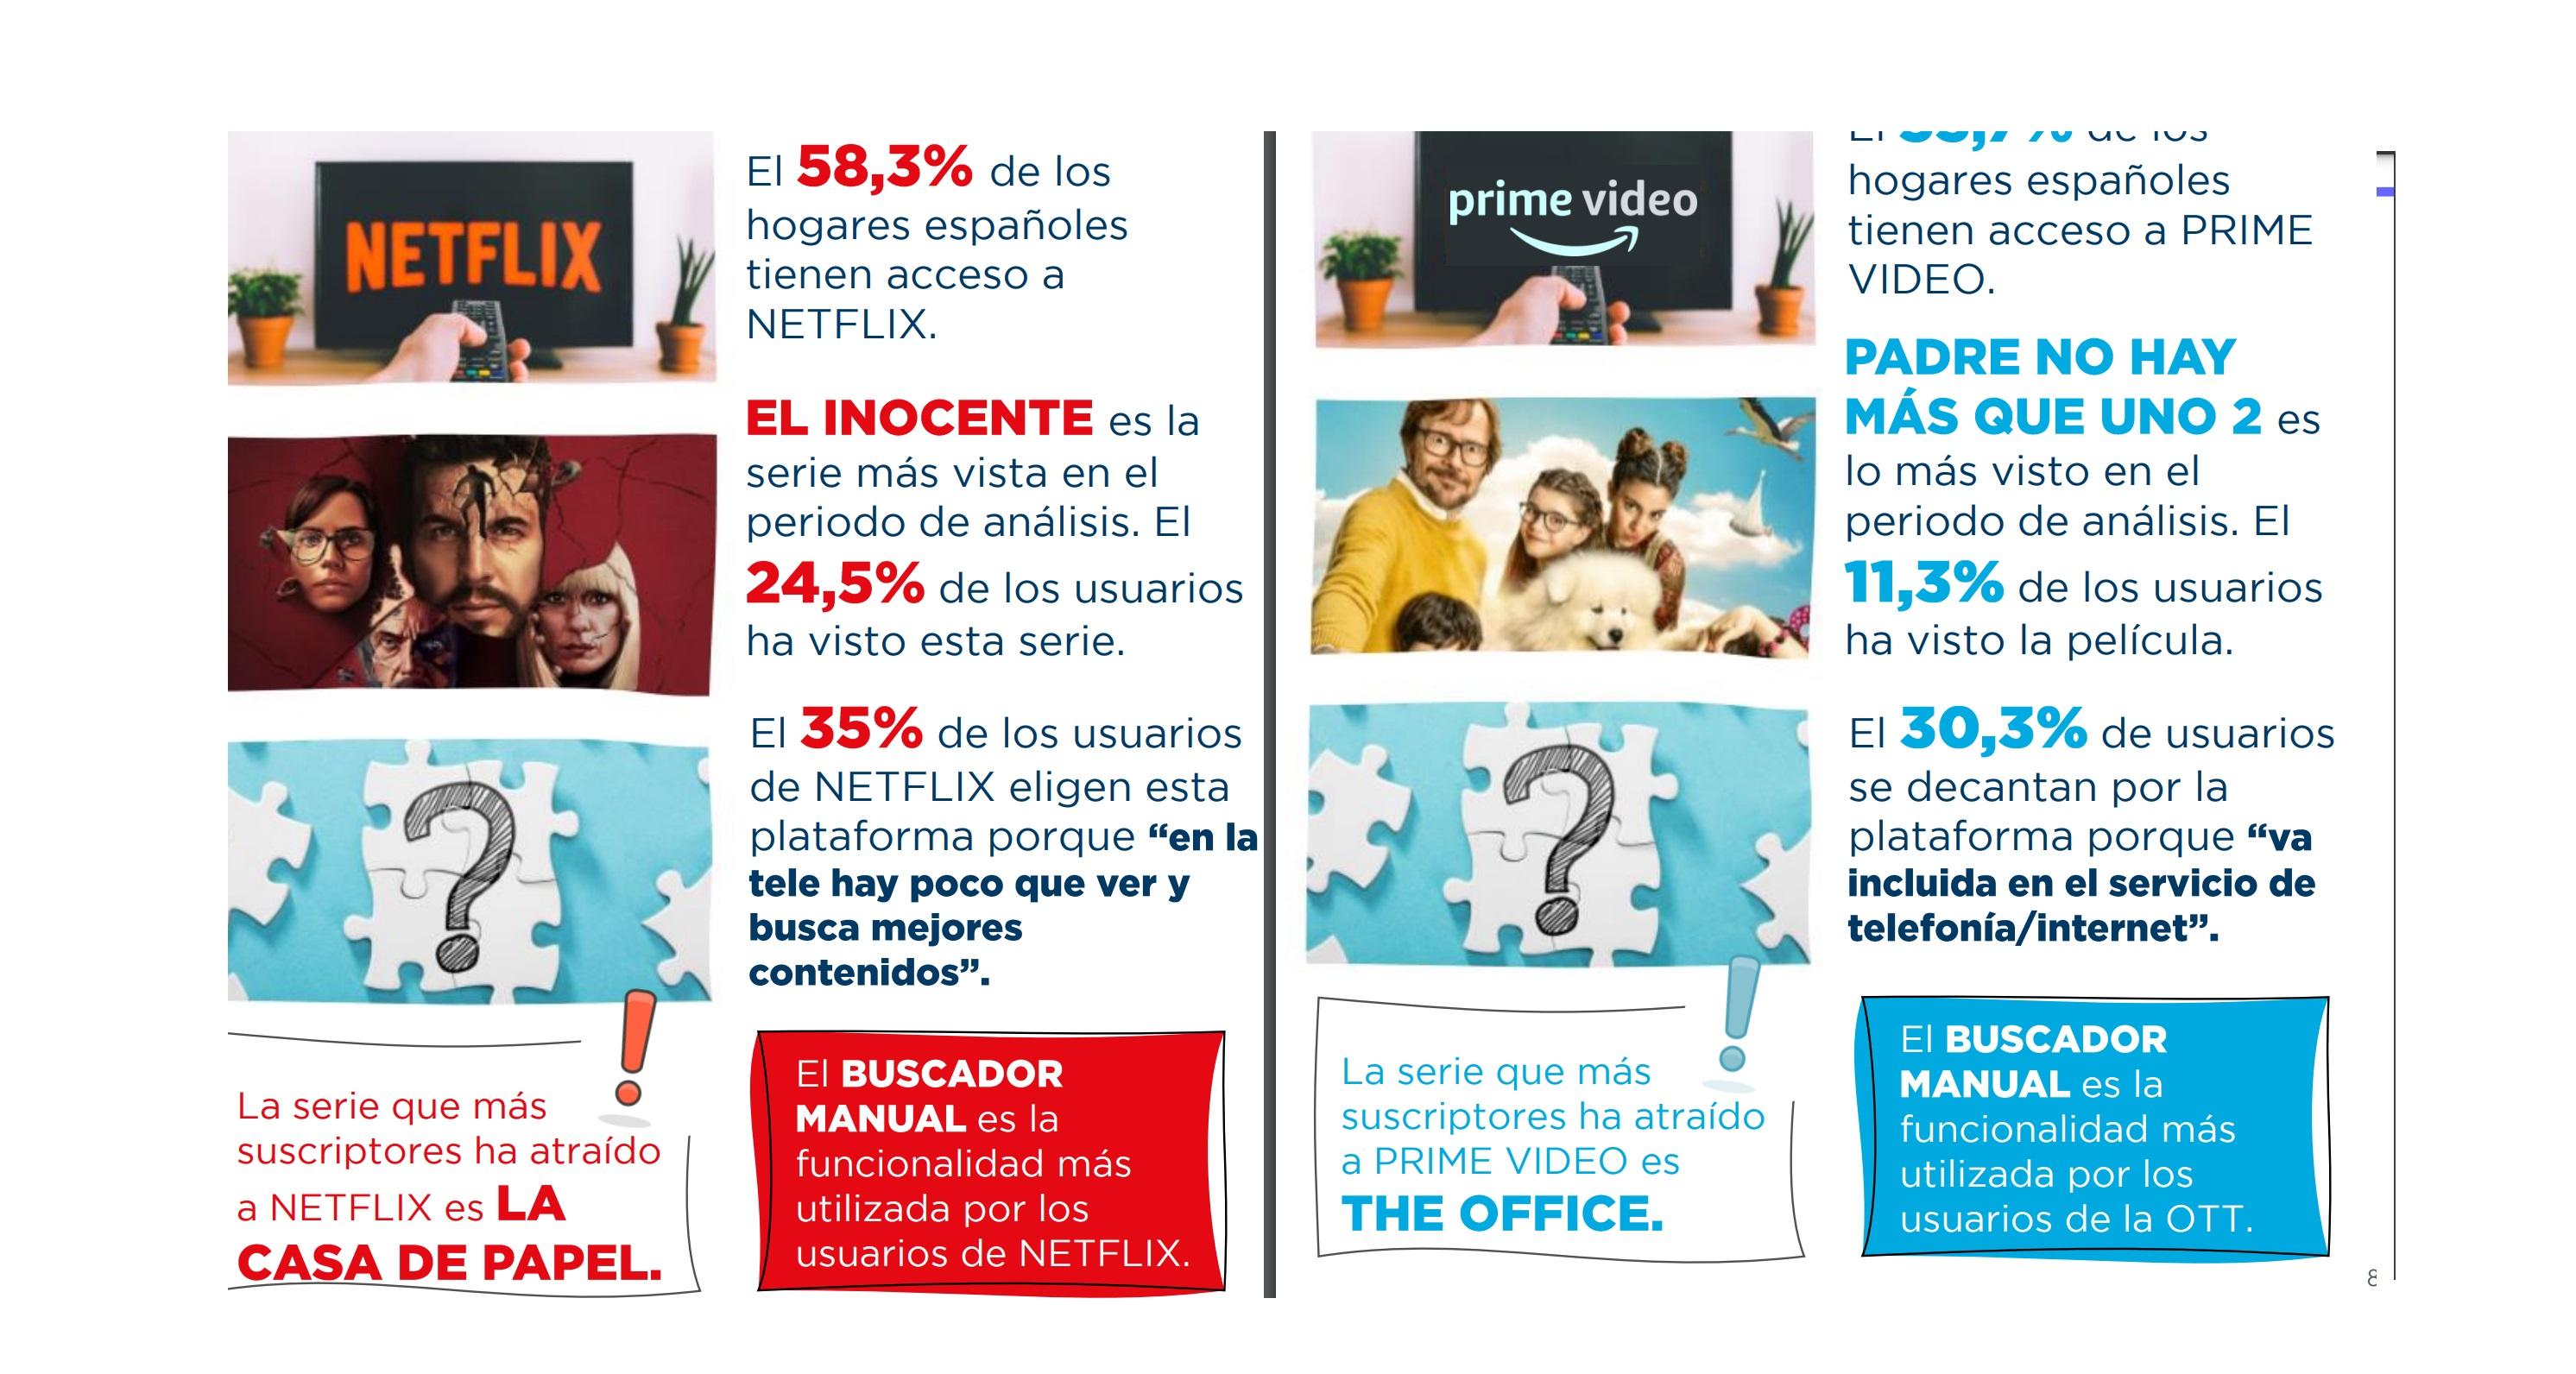 https://www.programapublicidad.com/wp-content/uploads/2021/07/netflix-prime-video-2ª-ola-2021-BARÓMETRO-TV-OTT-TRACKING-trimestral-Televisión-de-Pago-OTTs-España-plataformas-VOD-10.000-entrevistas-Barlovento-Comunicación-programapublicidad.jpg